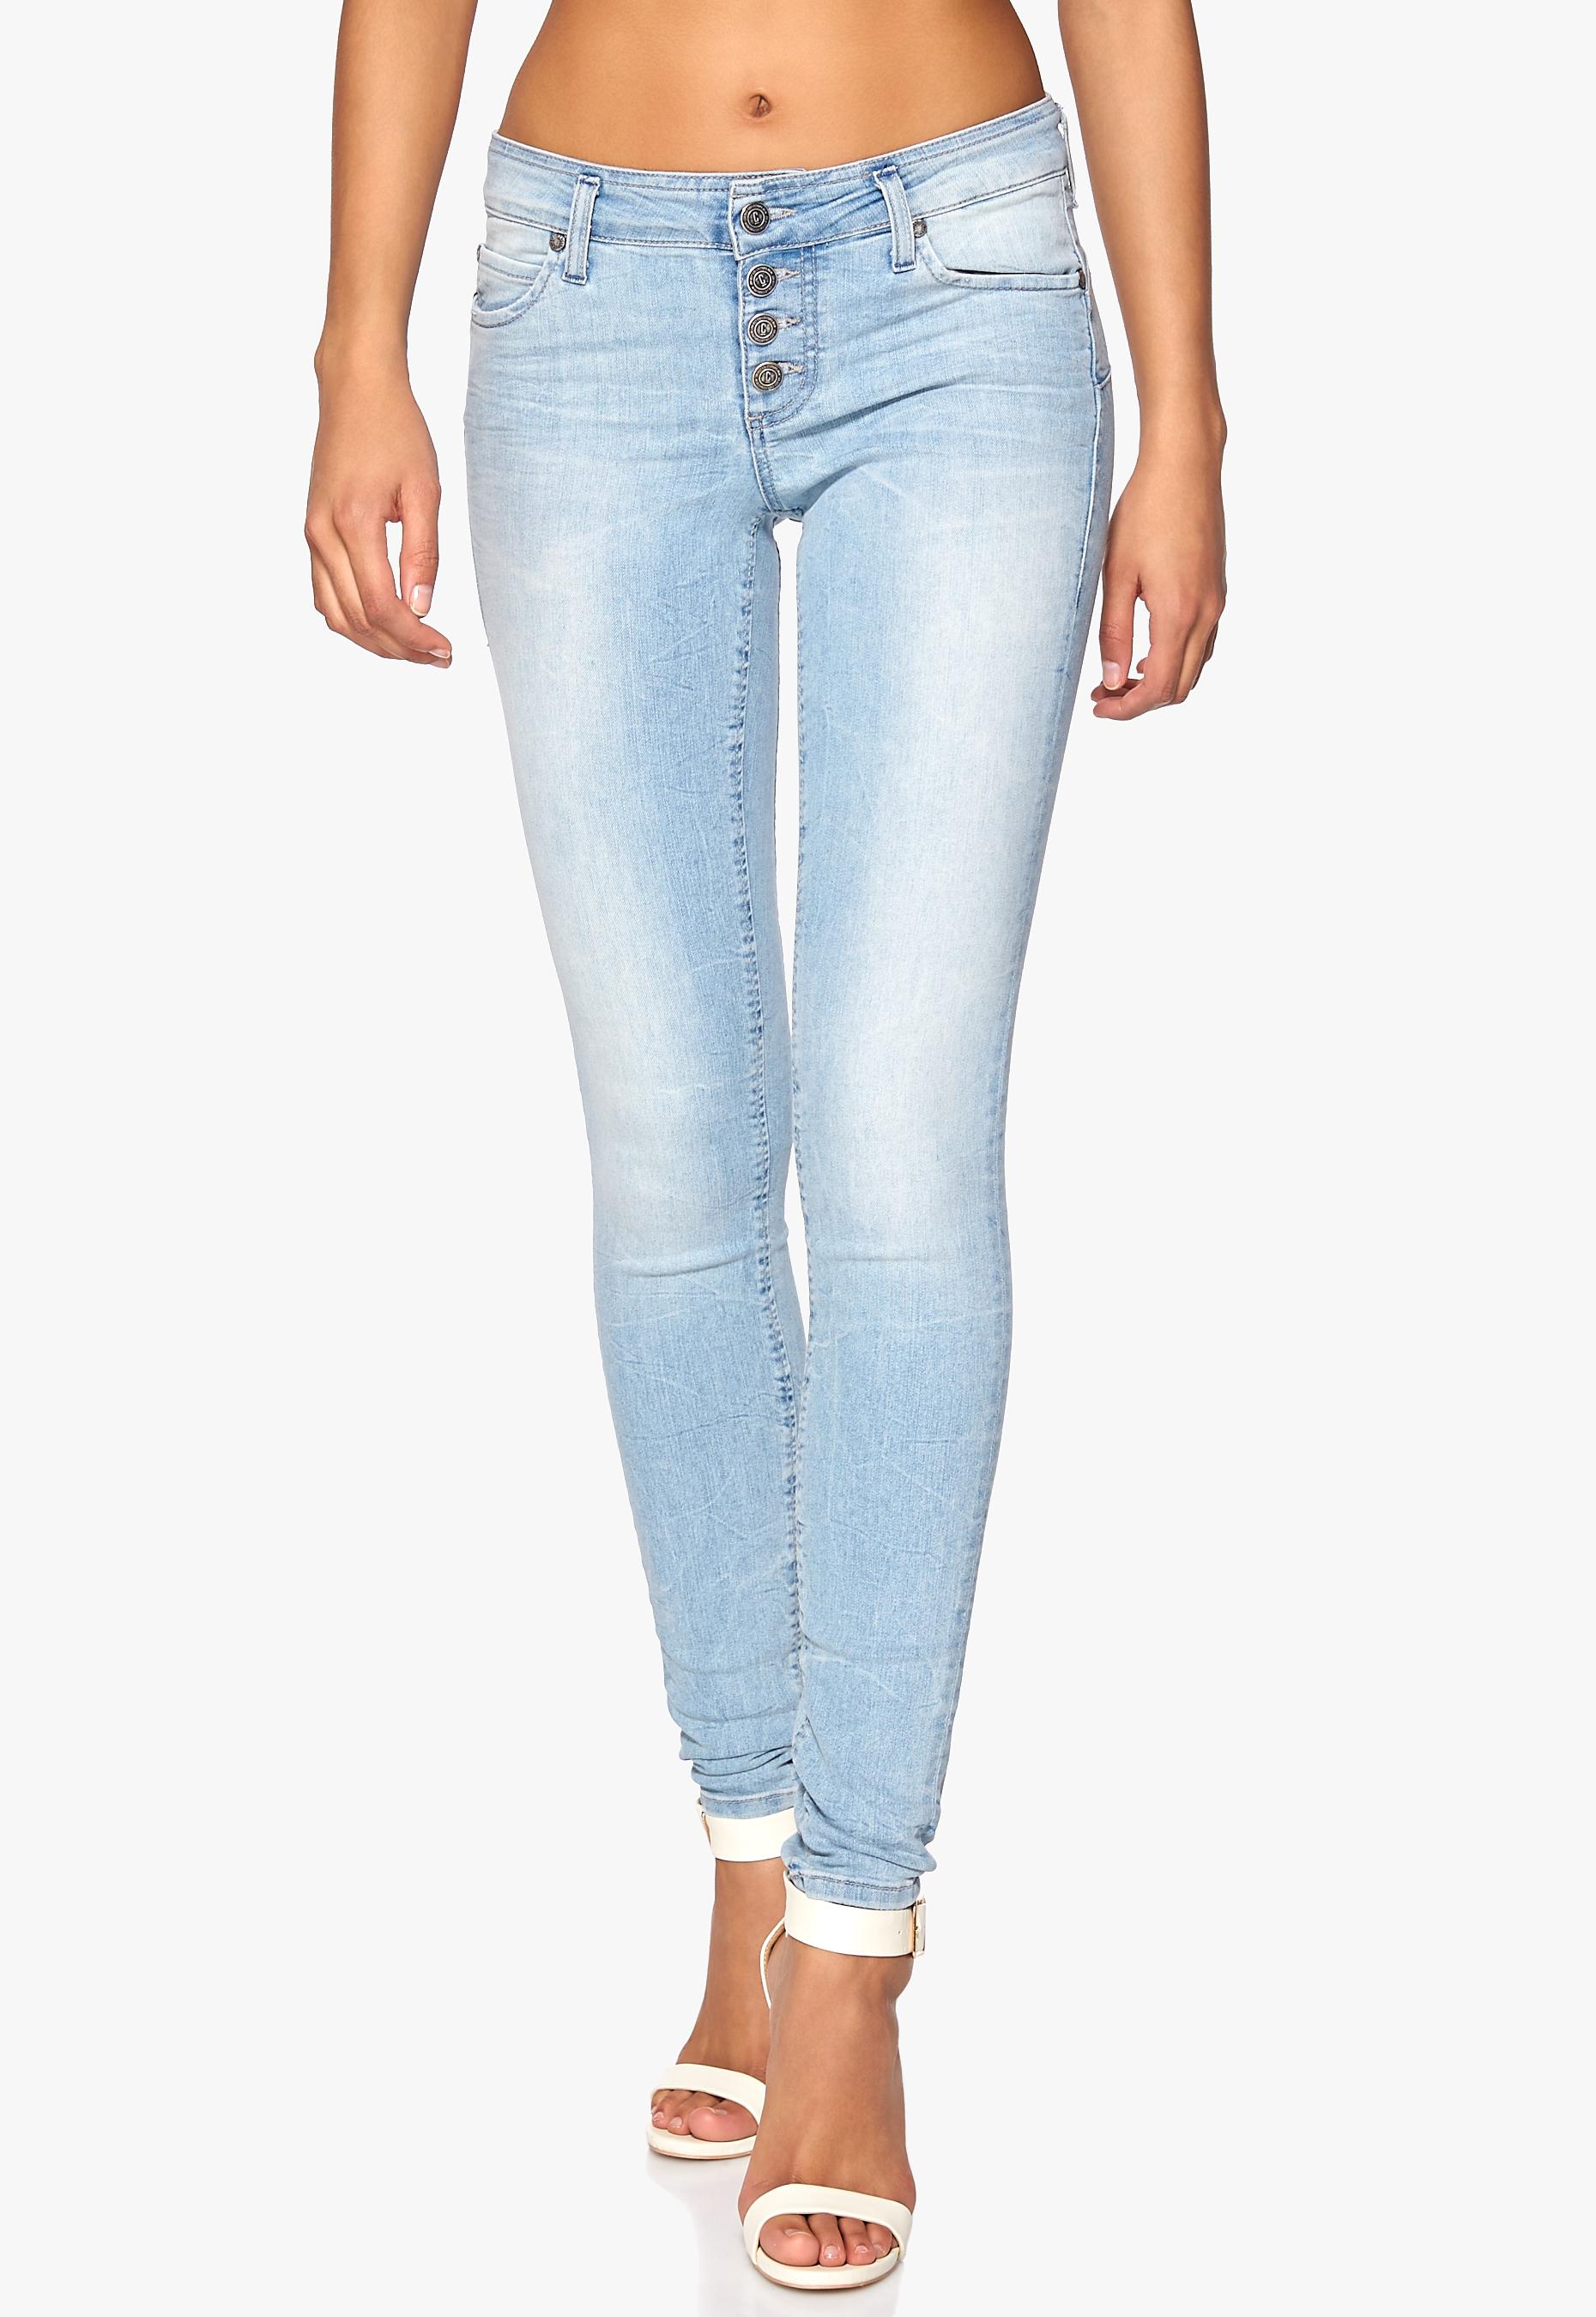 bff70ba4a783 OBJECT Liva Super Slim Jeans Light Blue Denim - Bubbleroom